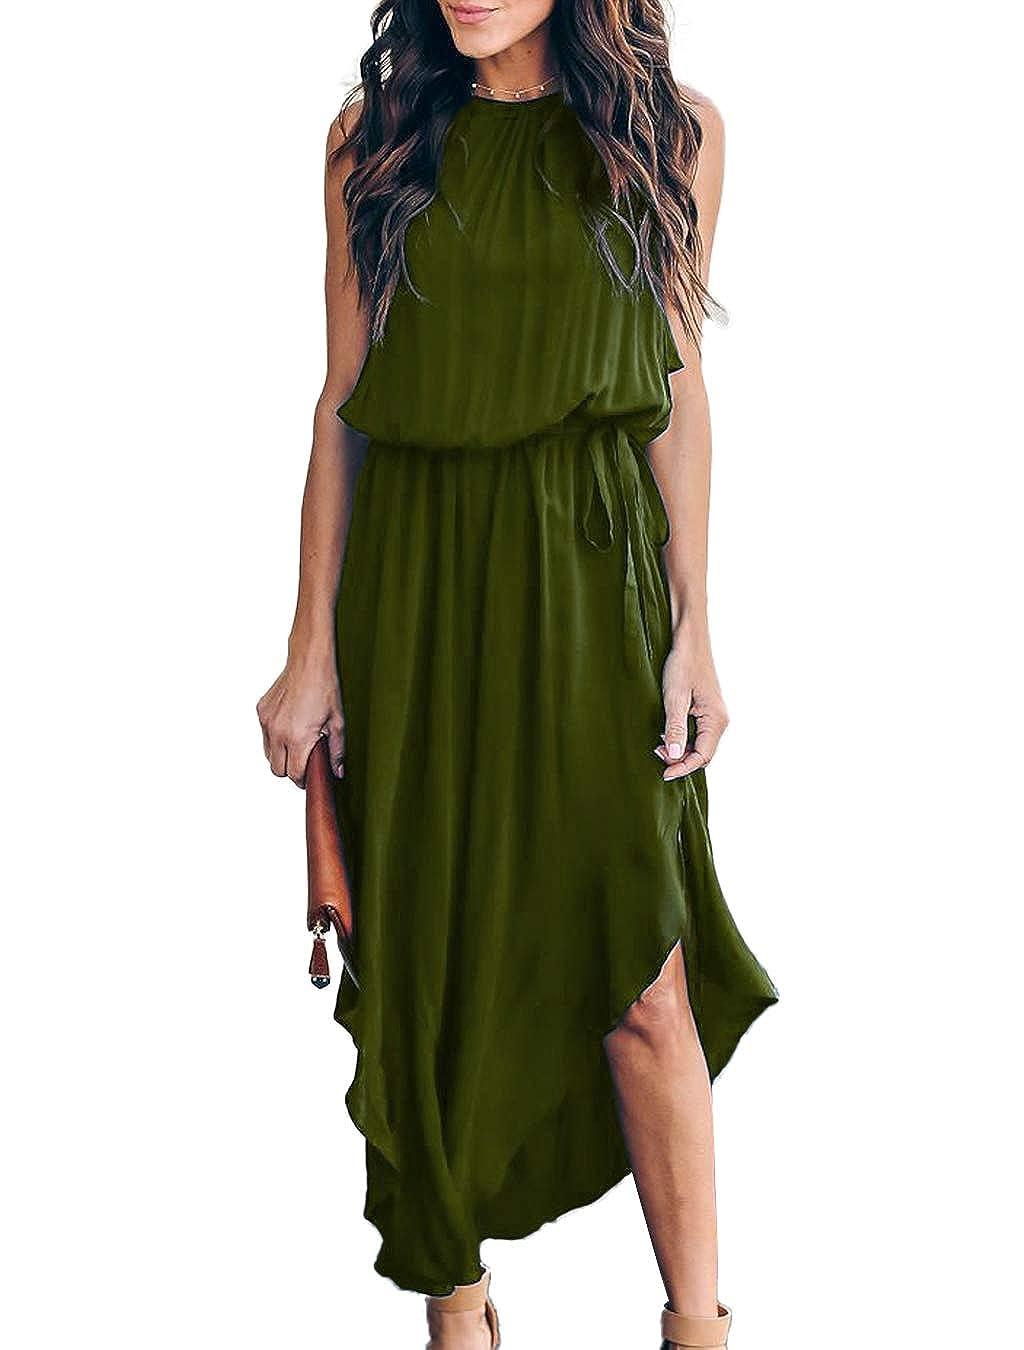 d2939af917ae Mlebr Womens Casual Chiffon Halter Sleeveless Slit Midi Dresses at Amazon  Women's Clothing store: